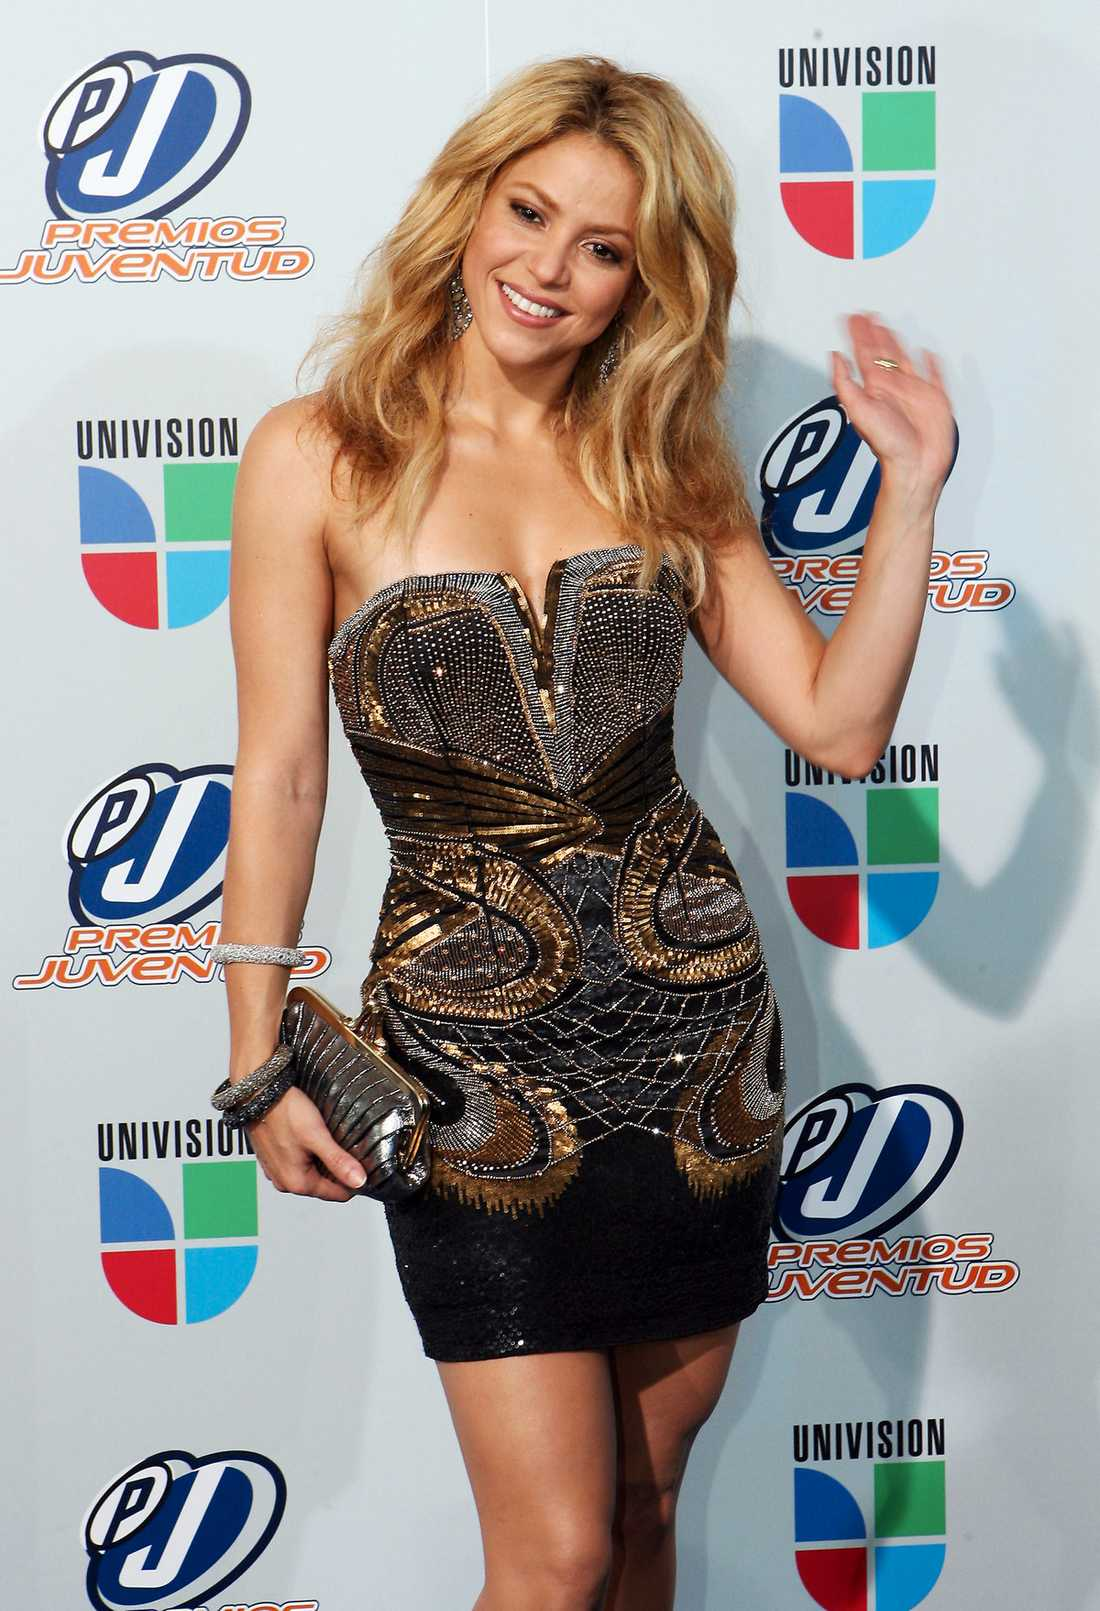 7. Shakira 9,1 miljoner